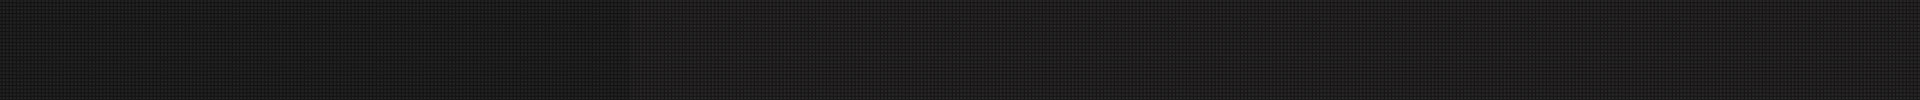 footer-bg.jpg - 25.22 kb